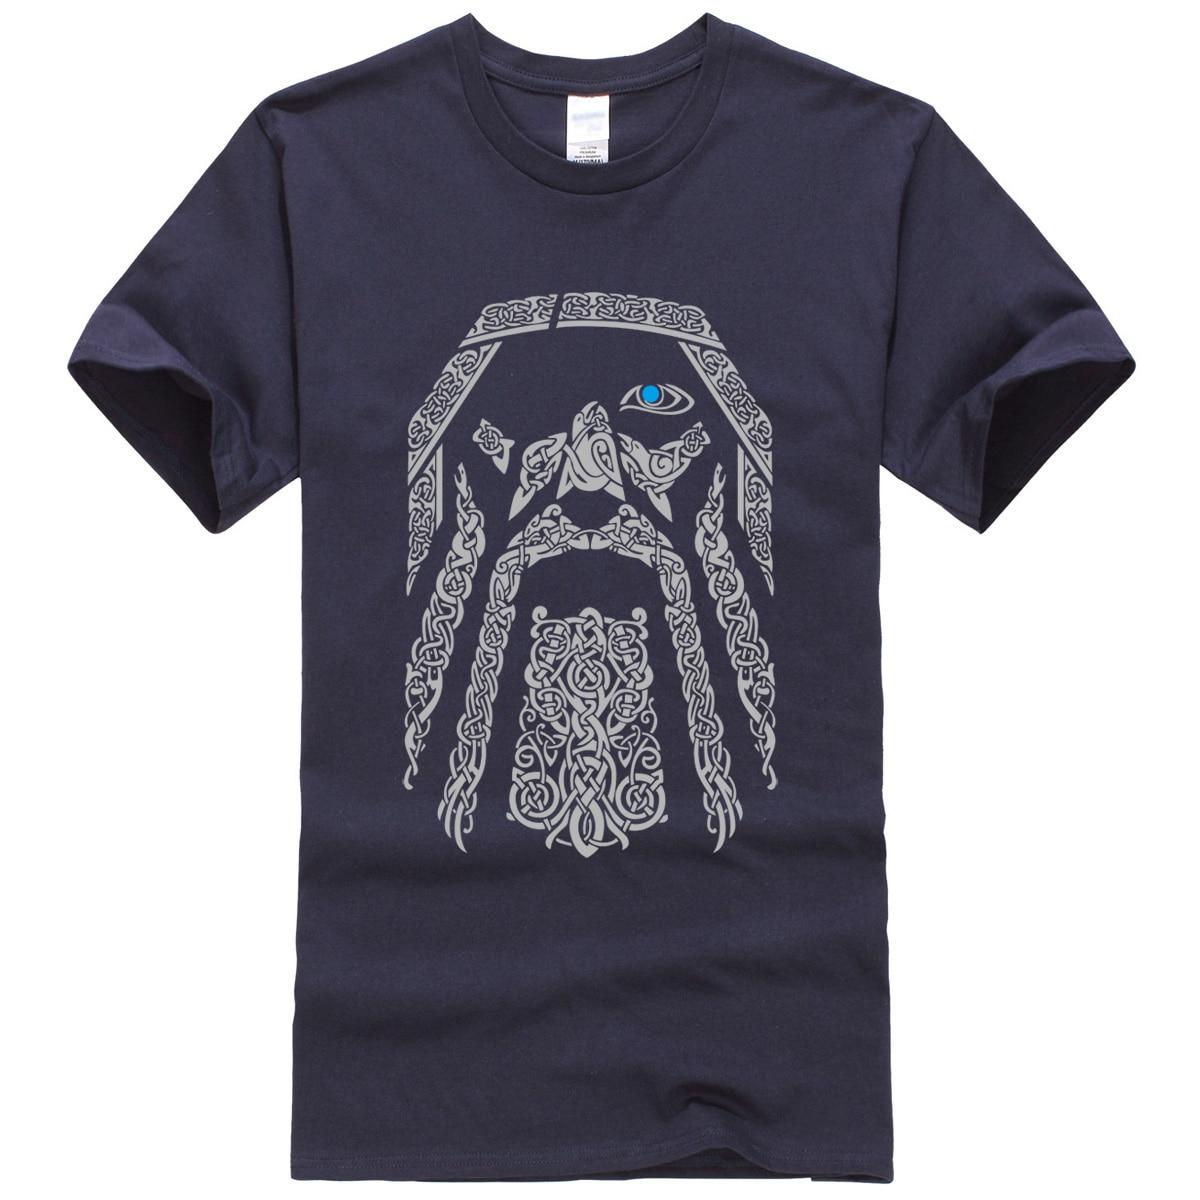 Os vikings legal hip hop streetwear punk camisetas masculinas 2019 primavera verão novos topos camisetas harajuku tshirt masculino k-pop t camisa